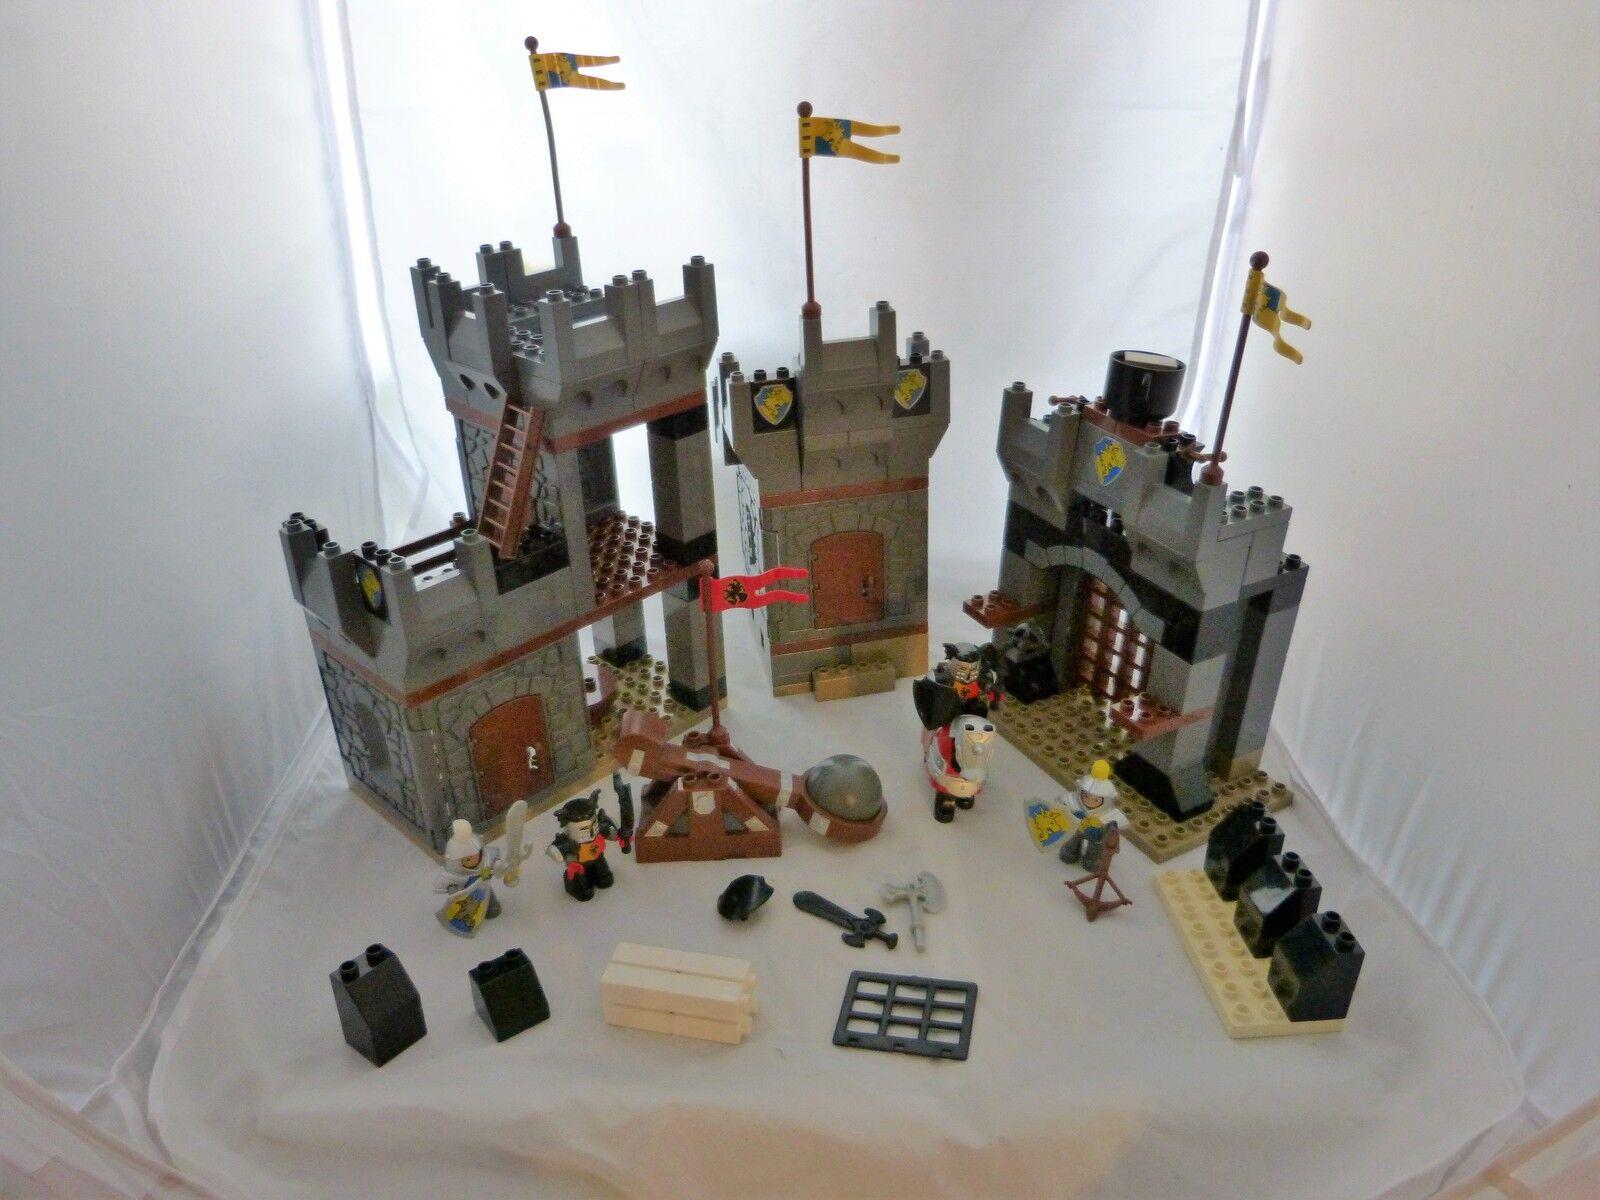 LEGO DUPLO Explore  Cavalieri Castello 4777  vendita scontata online di factory outlet